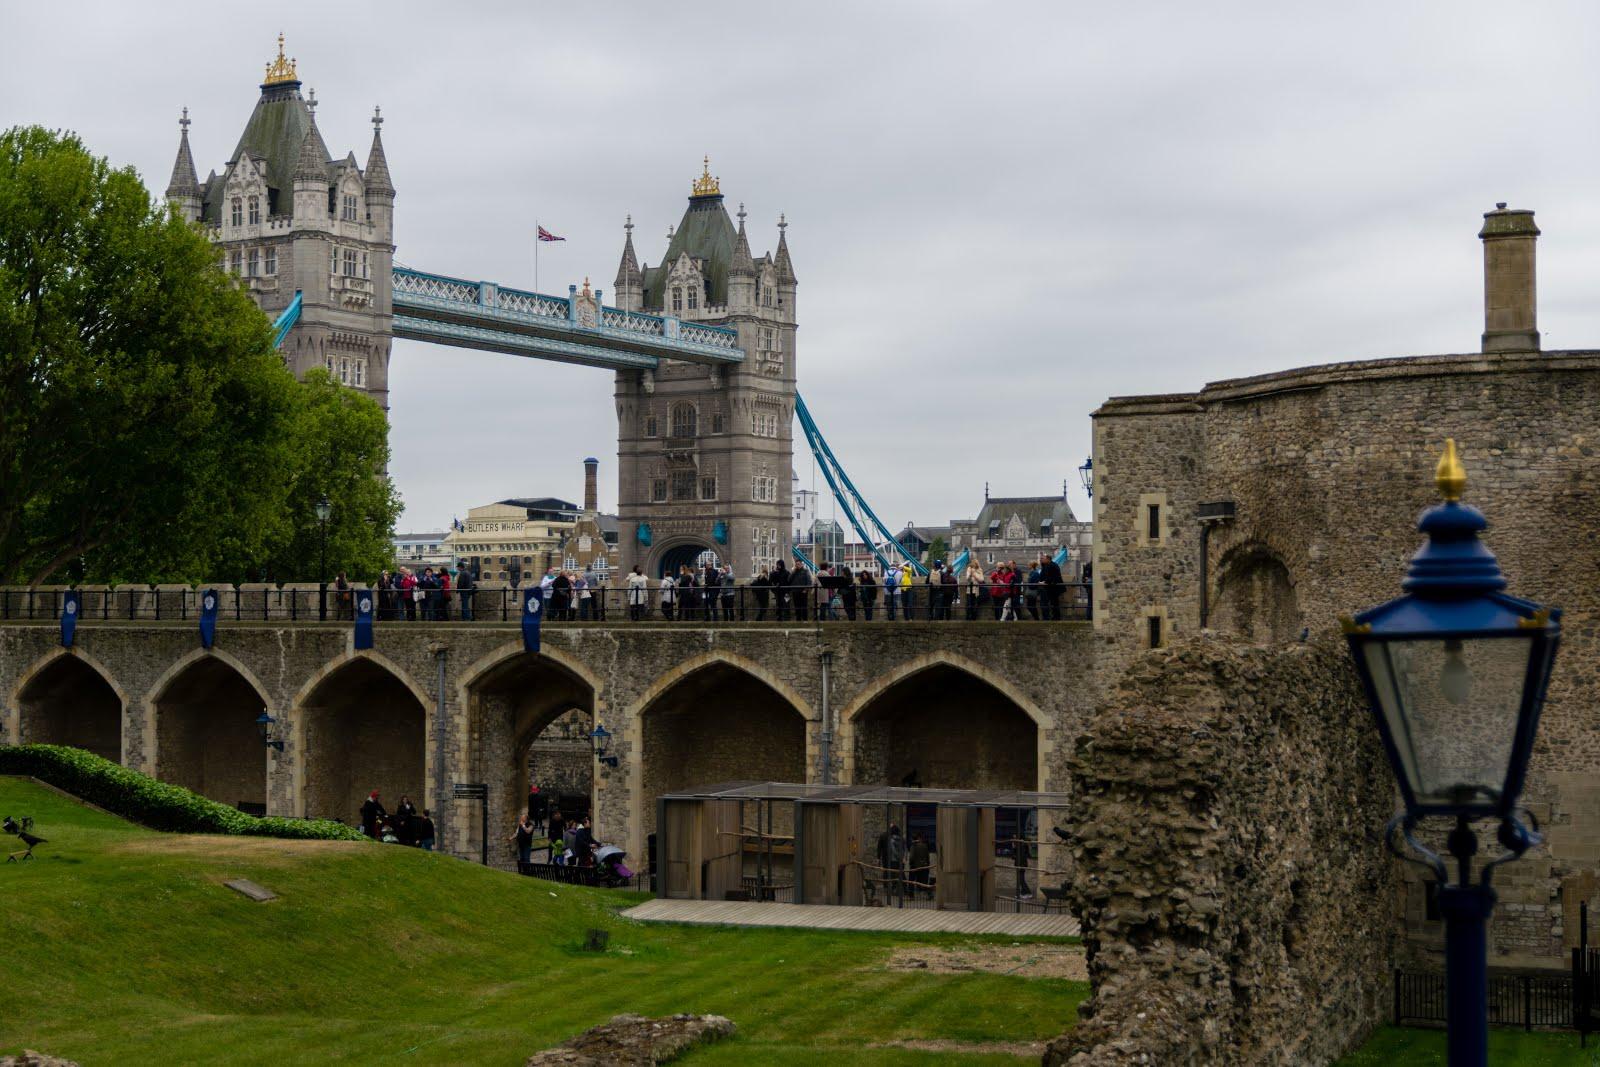 Tower of London Torre de Londres